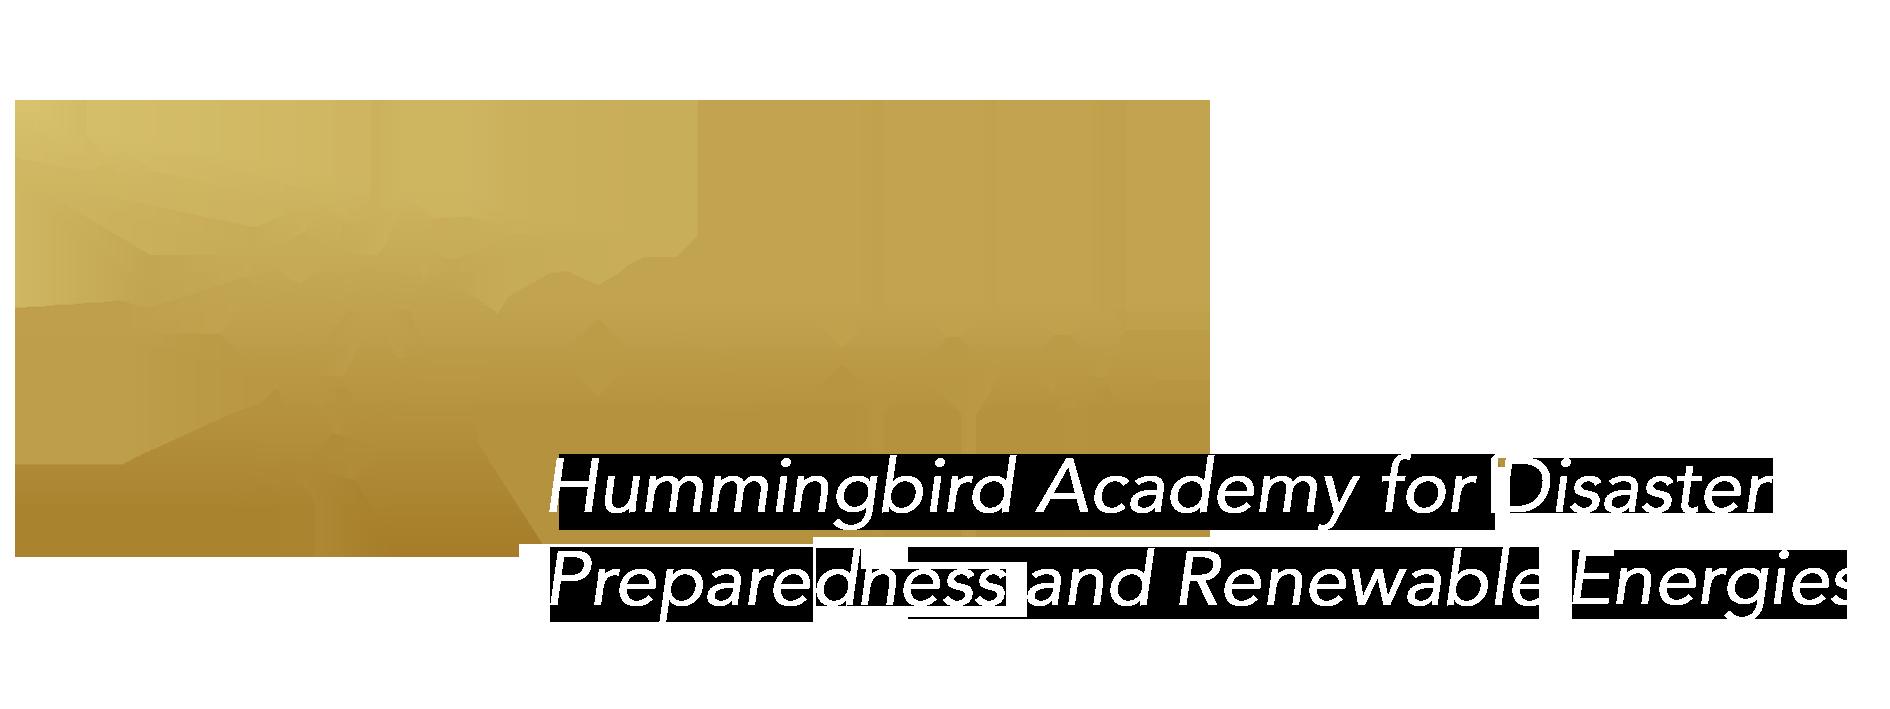 Hadpre